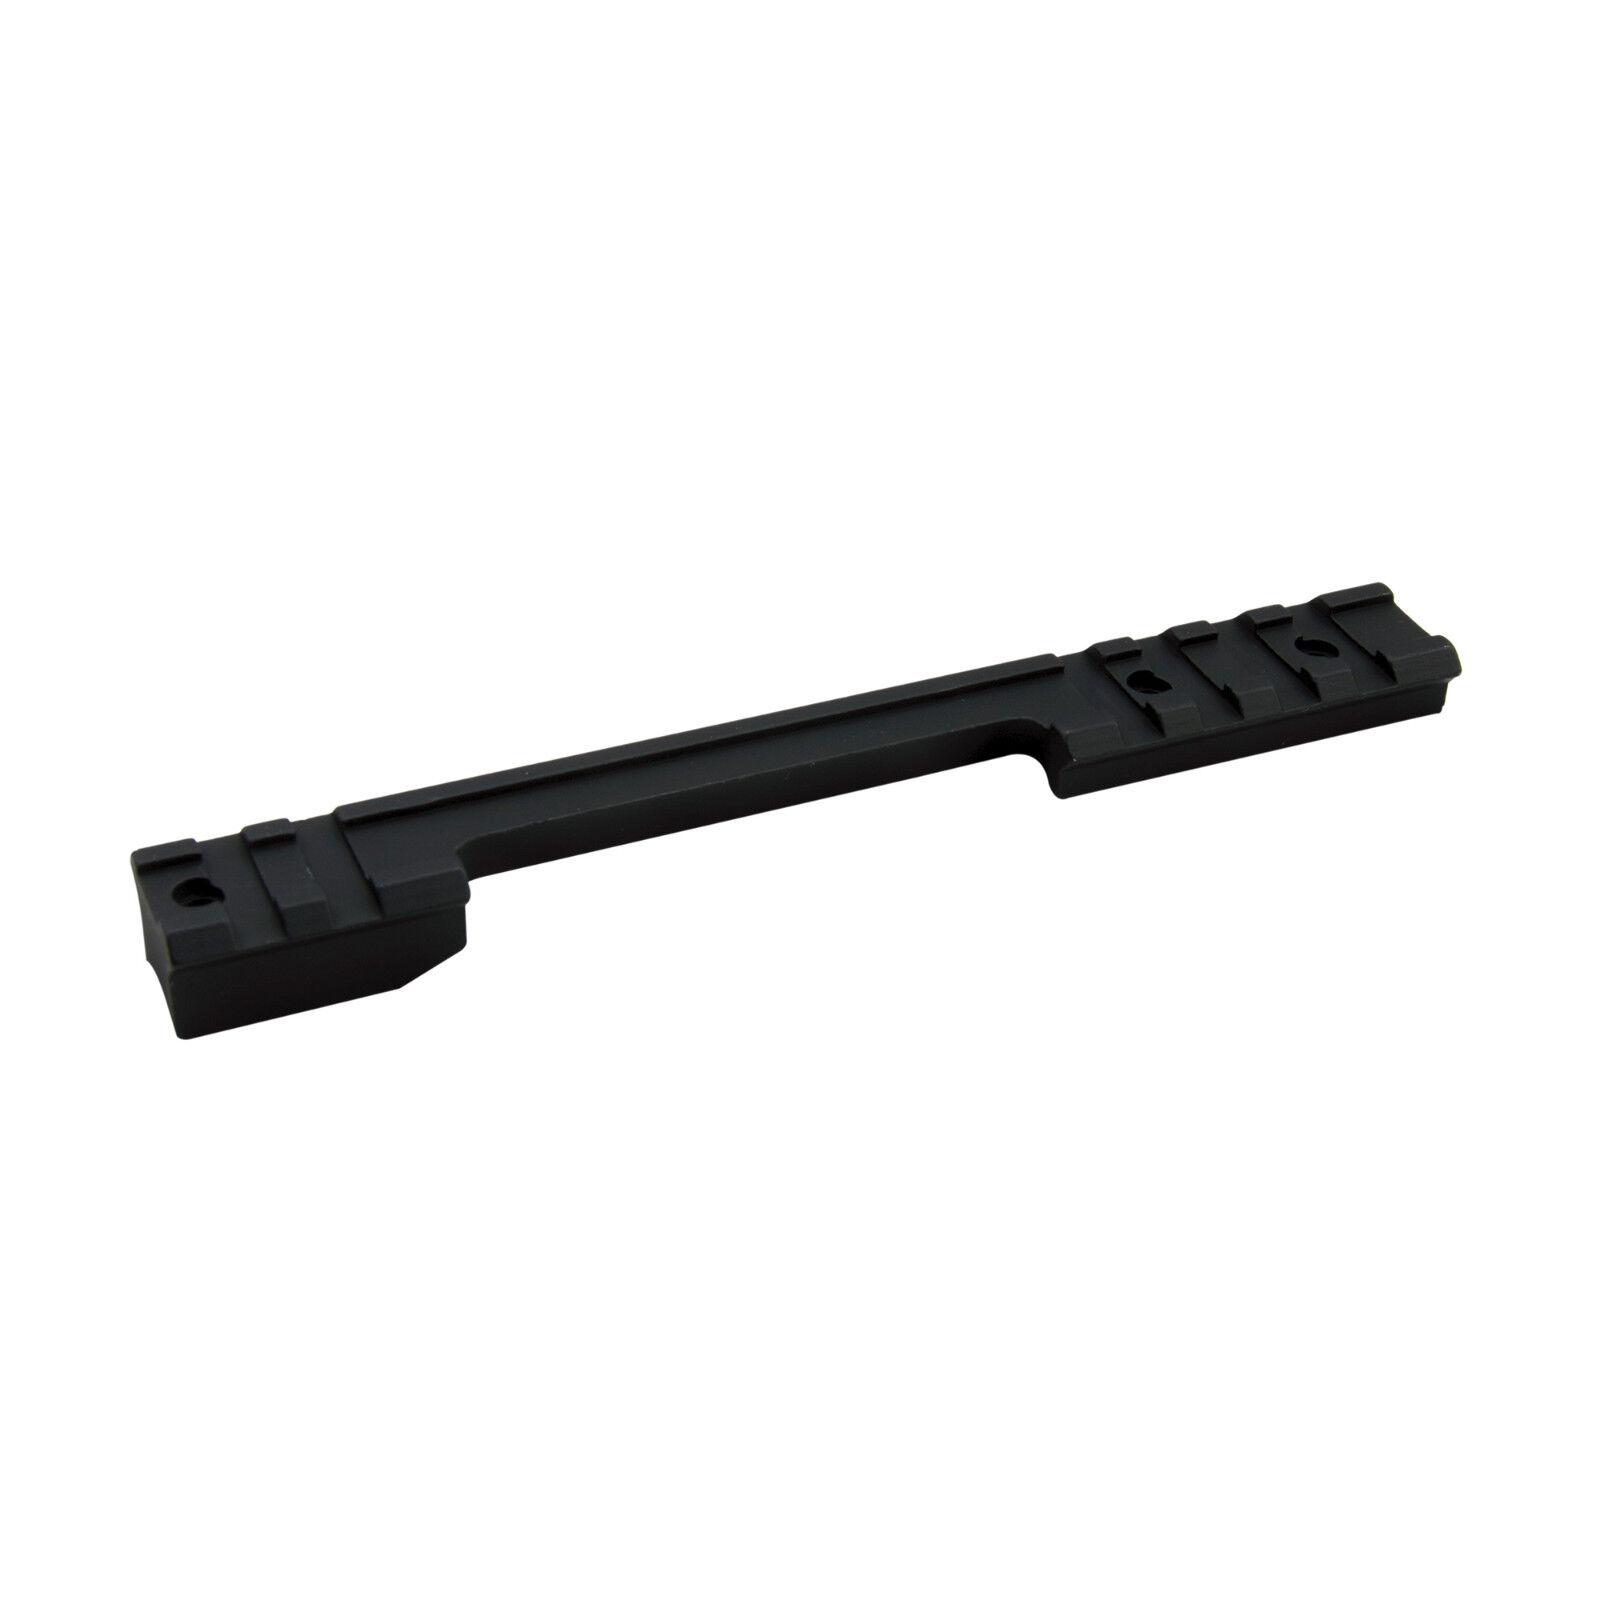 CCOP USA Picatinny Steel Scope Mount Base for Mauser FN PB-MAU003